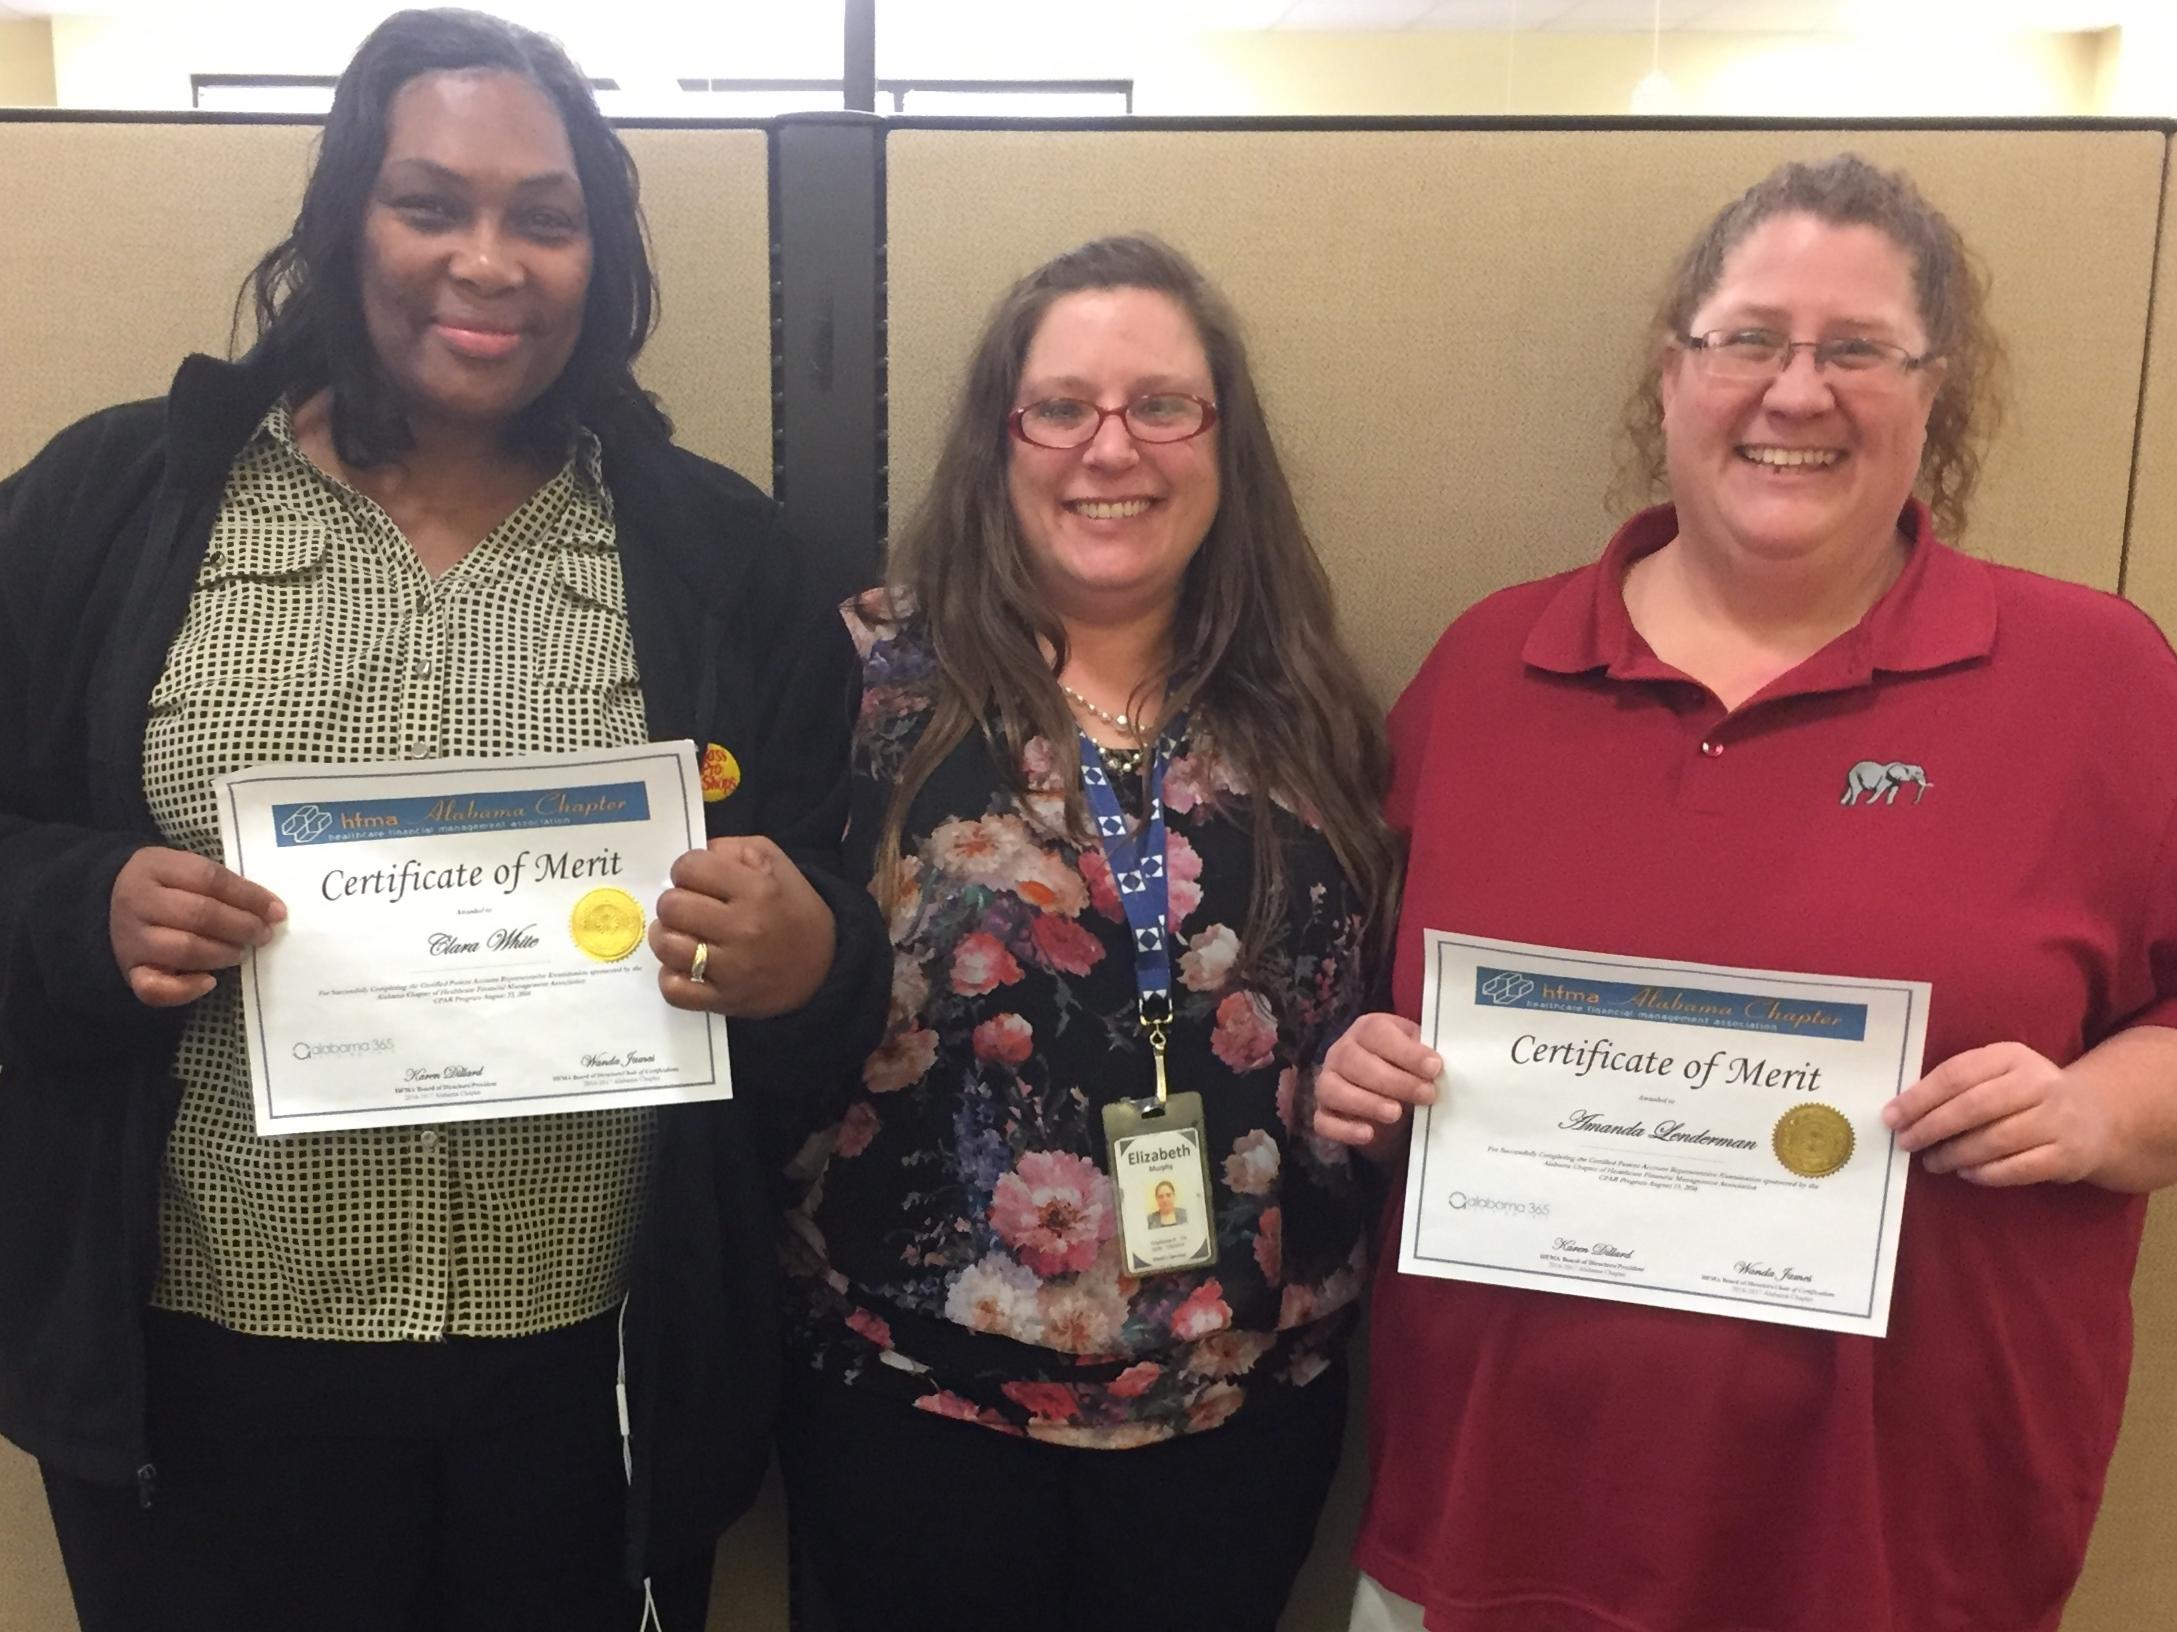 Medco ladies that passed the exam in 2016 in Huntsville.  (L to R) Clara White, Beth Murphy, Amanda Lenderman.